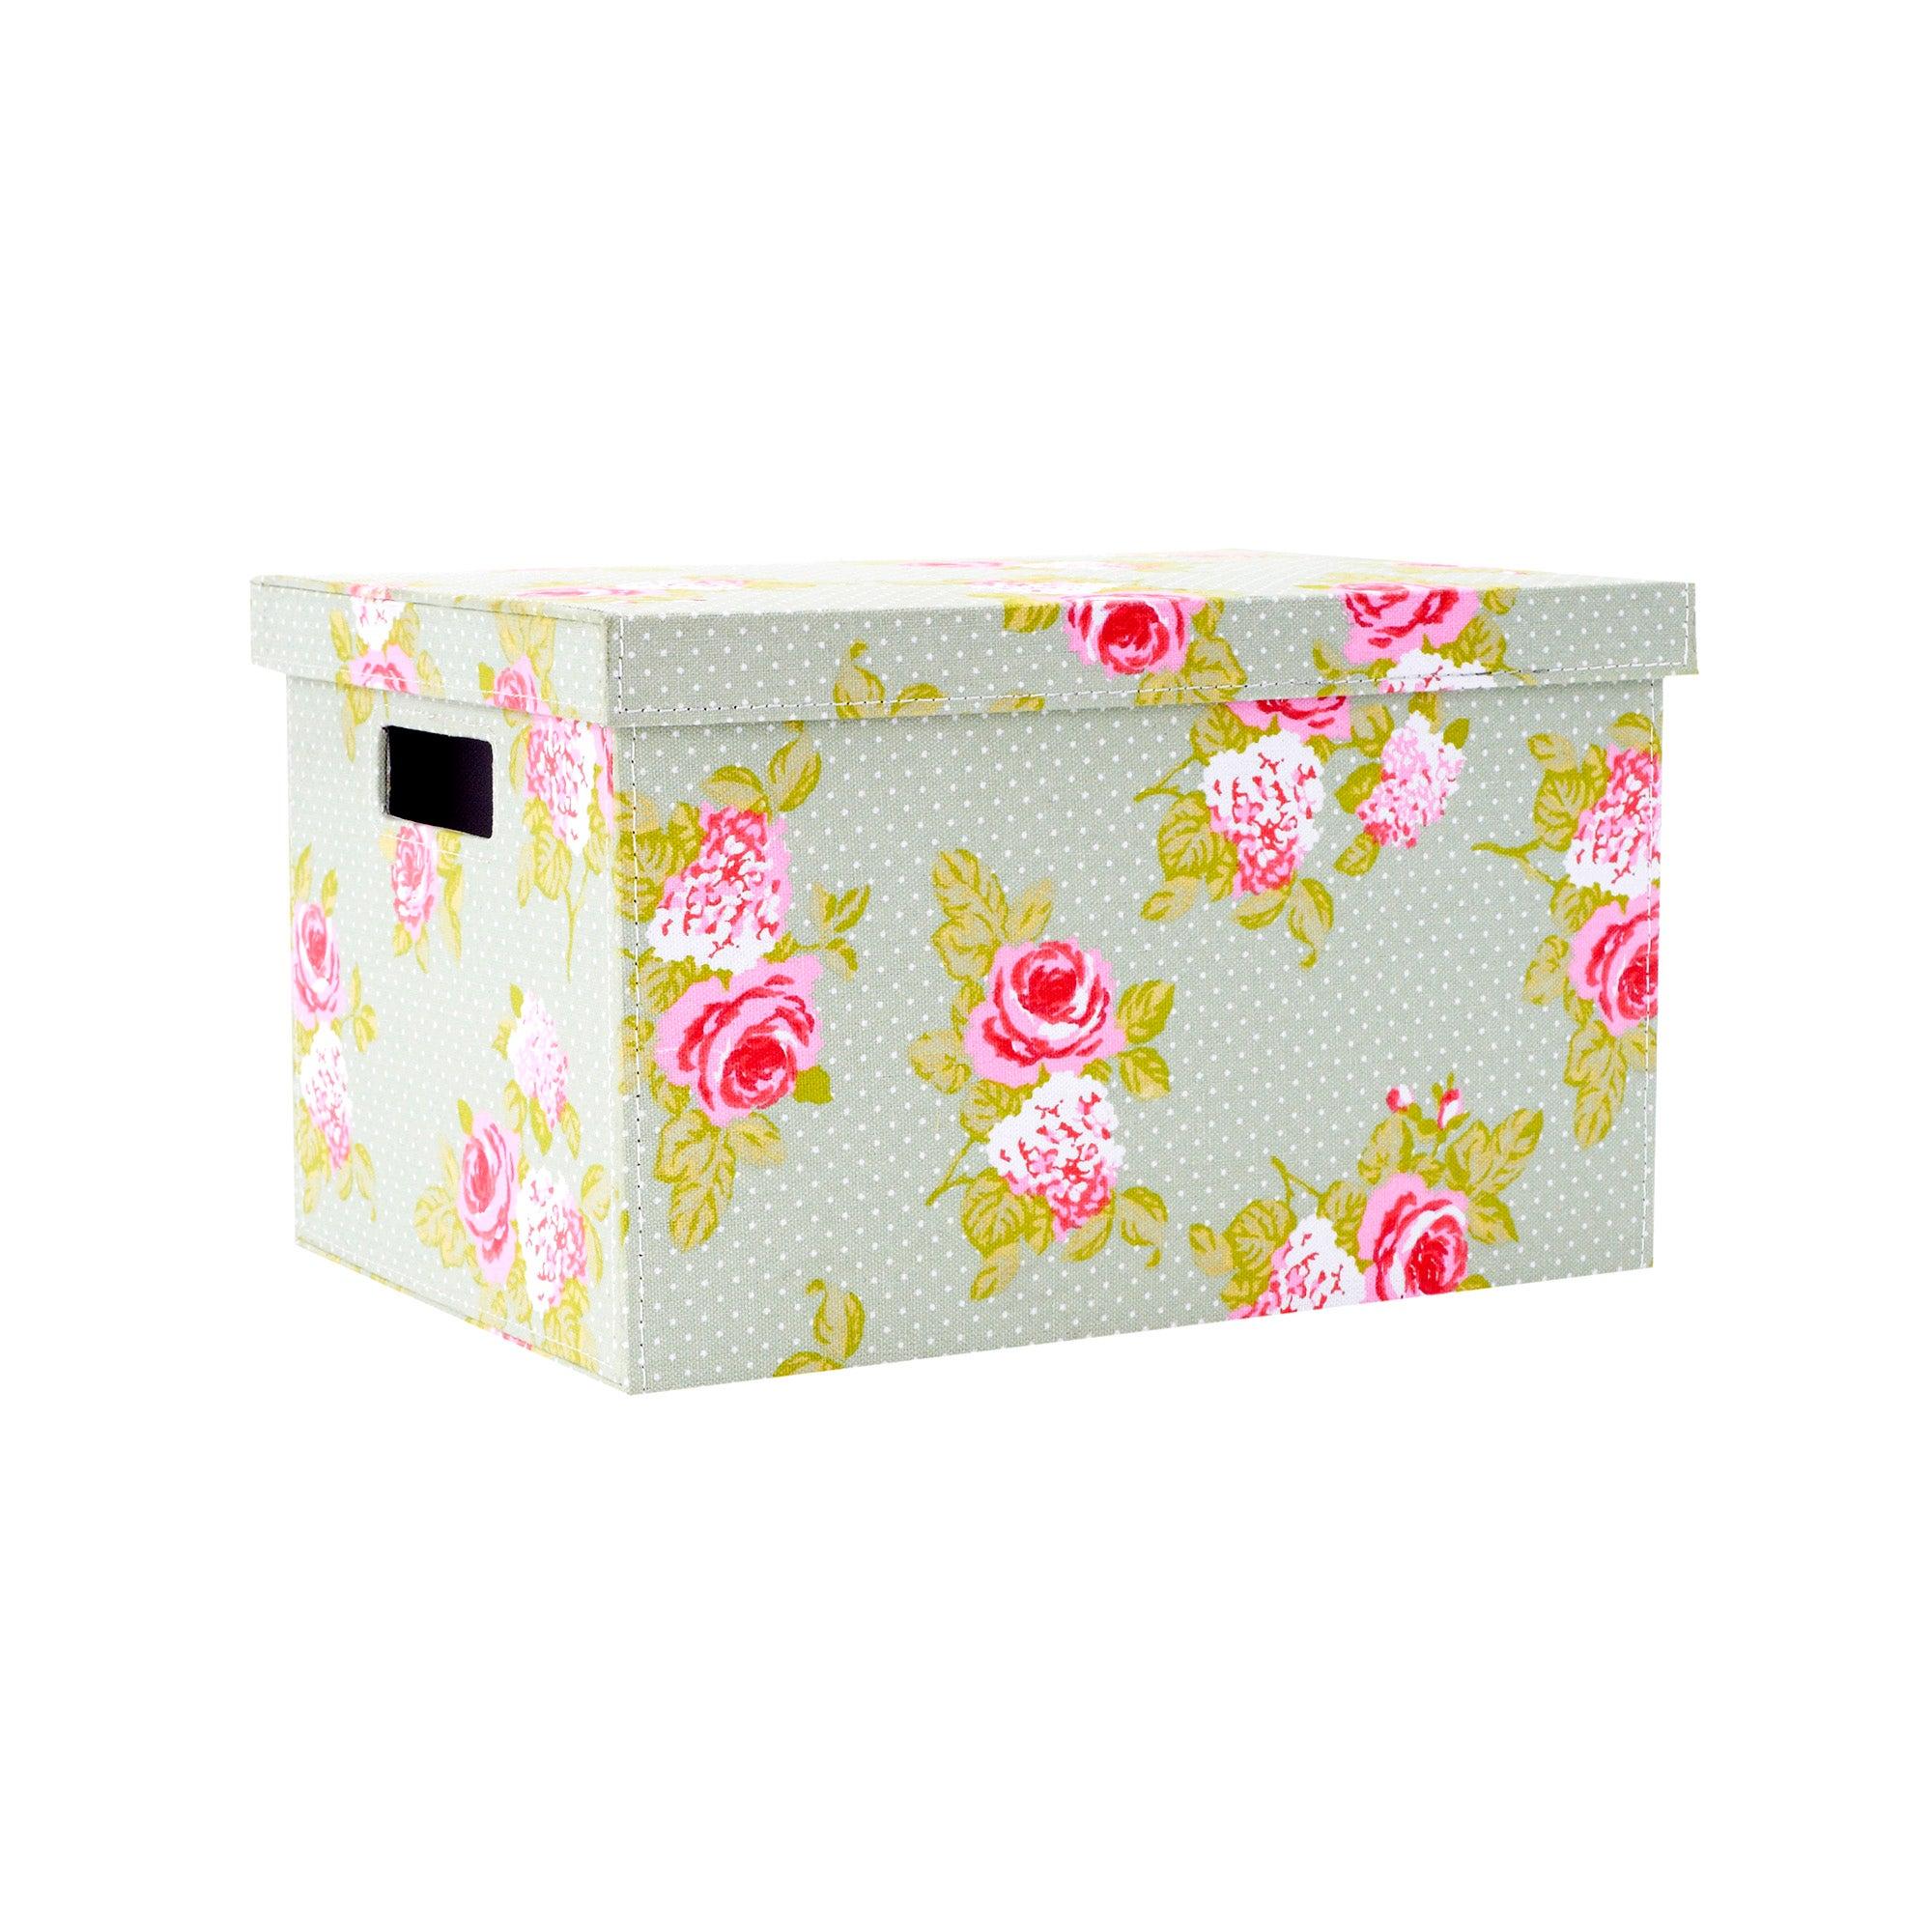 Annabelle Collection Storage Box